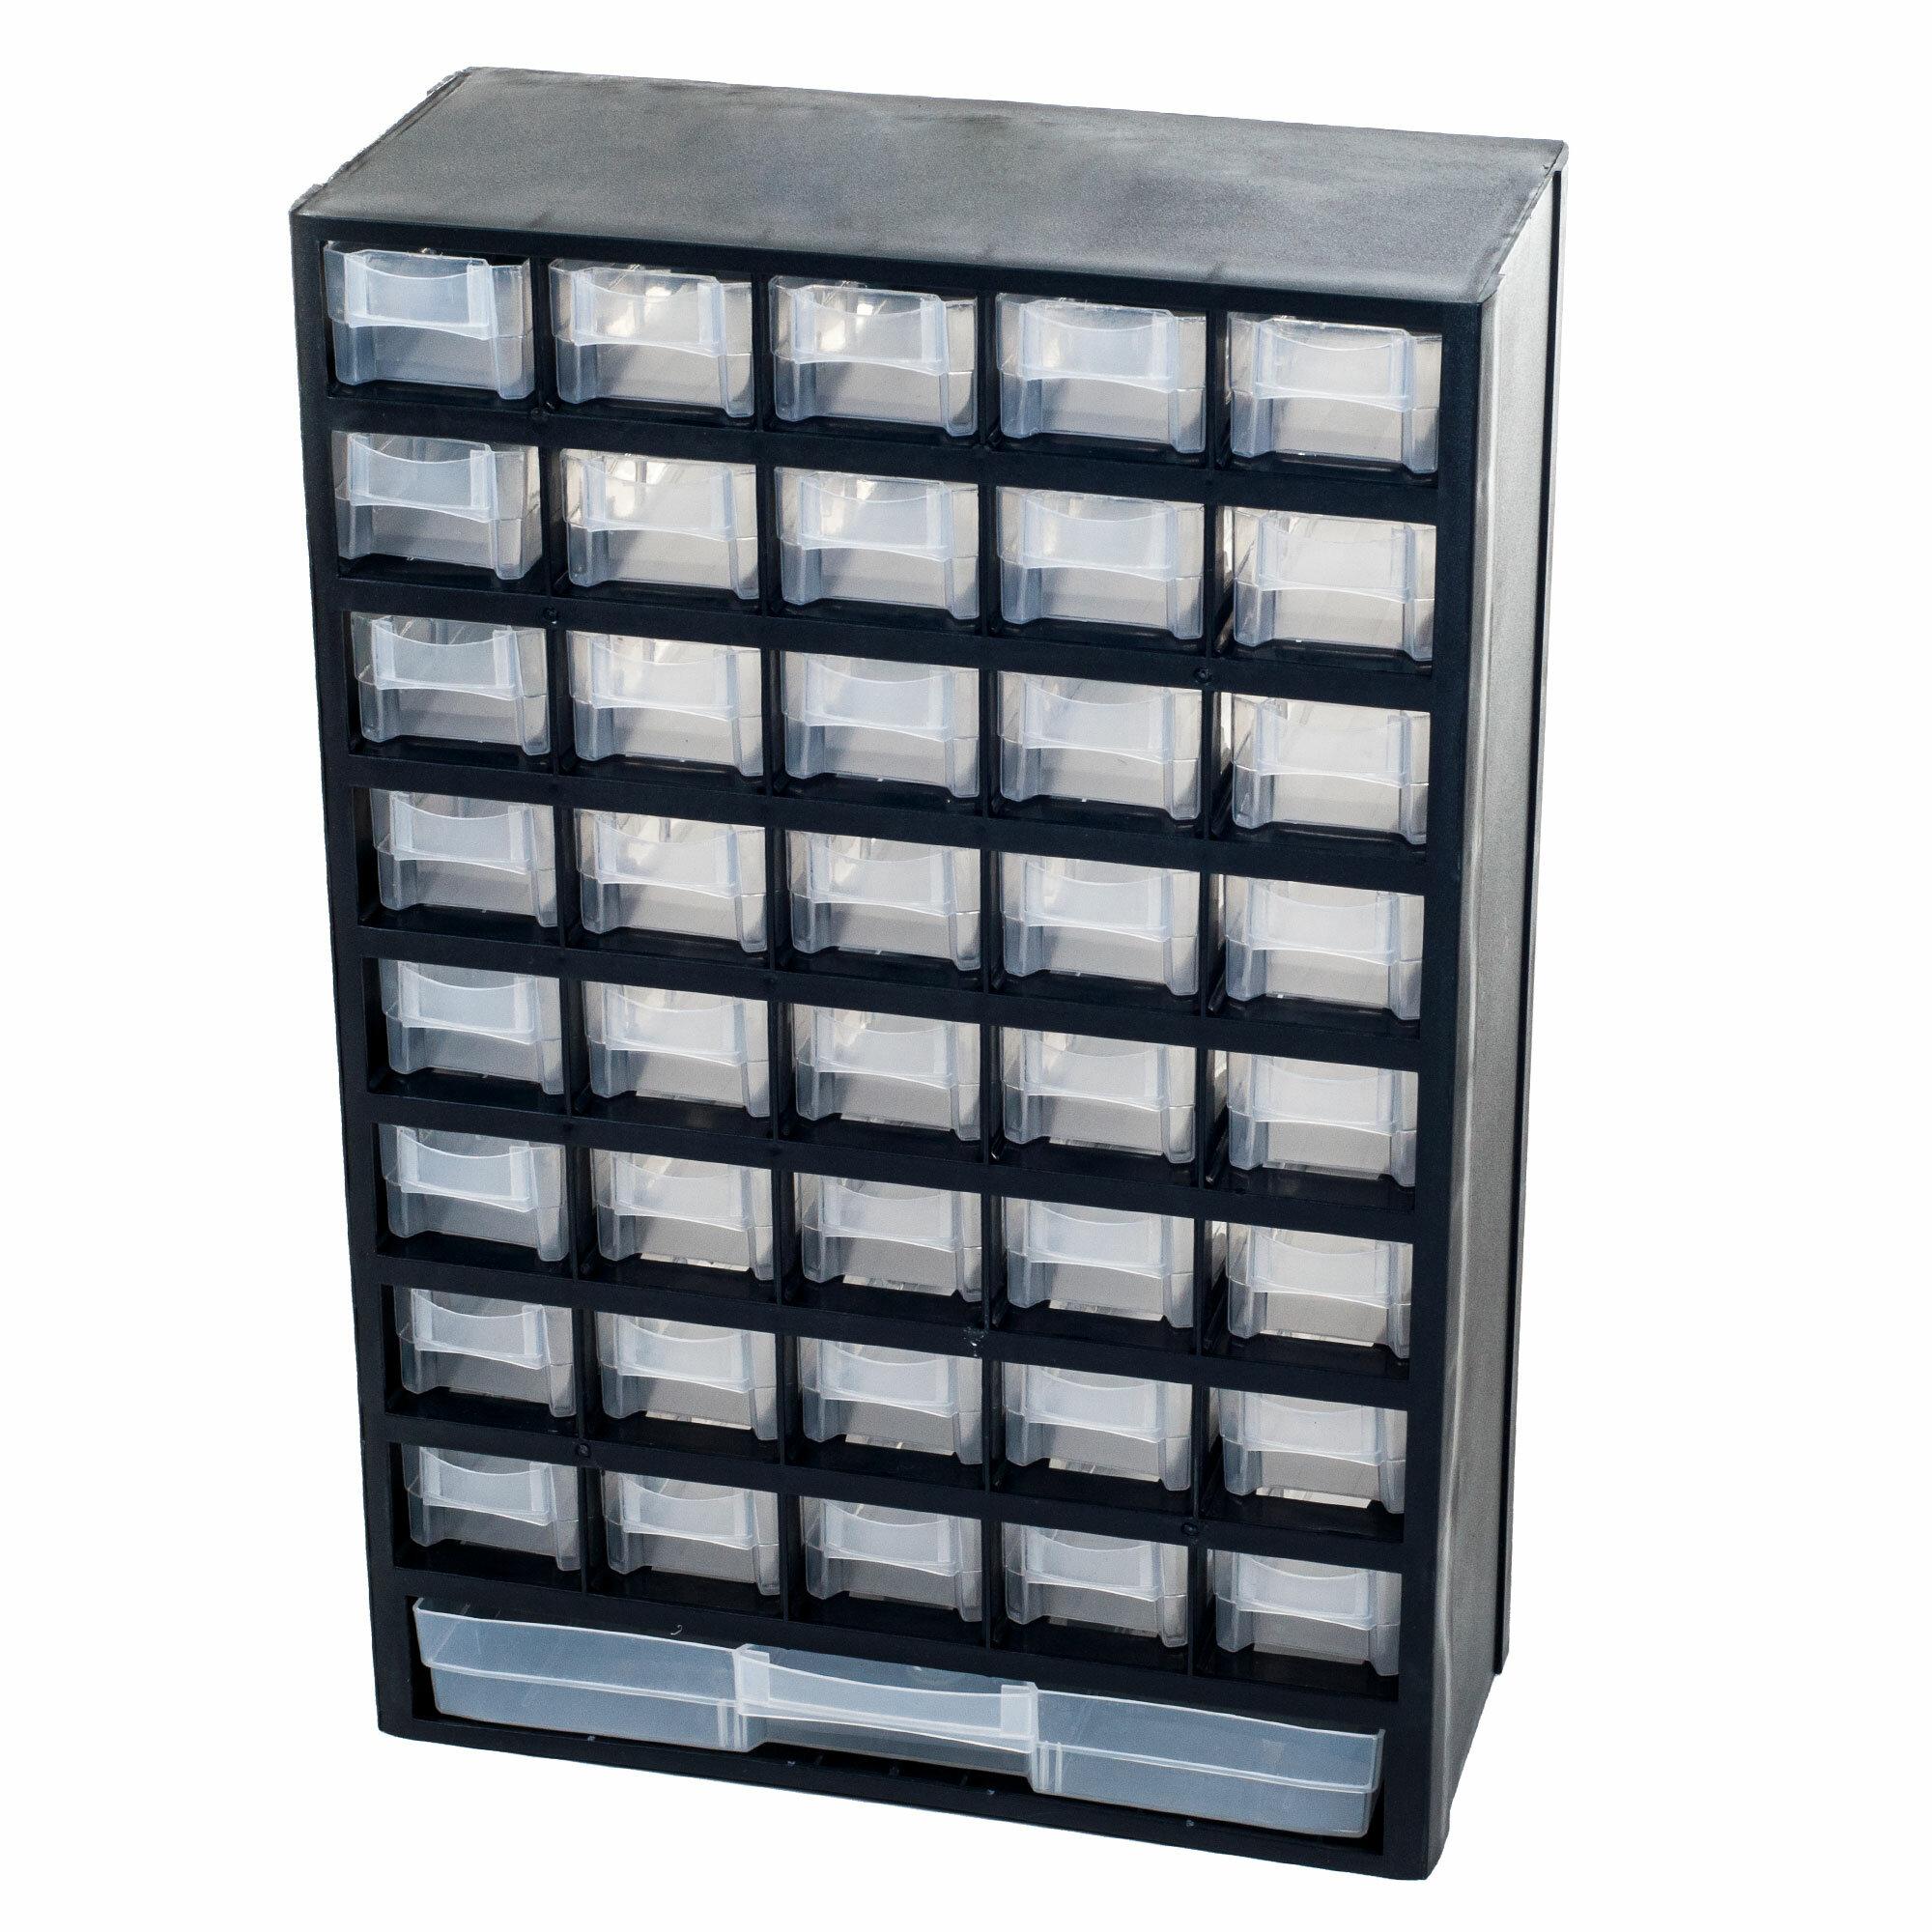 Merveilleux Stalwart Stalwart 41 Compartment Hardware Storage Box U0026 Reviews   Wayfair